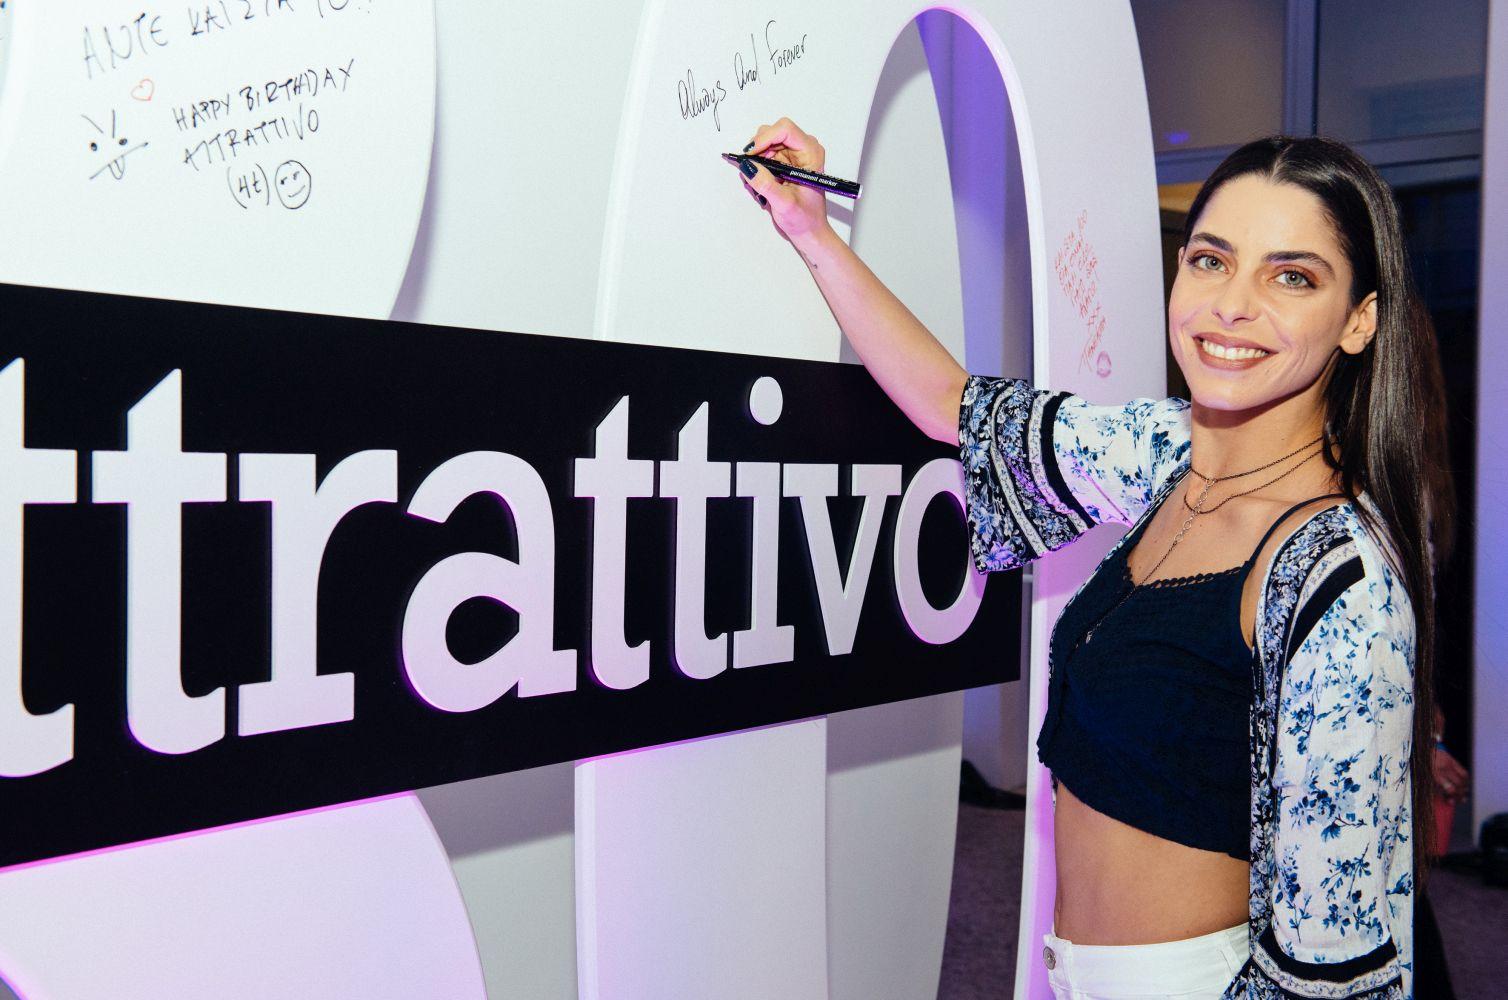 ba17bf1f6136 Κατάλογοι Ρούχων   Τάσεις Μόδας - attrattivo - attrattivo party  The ...